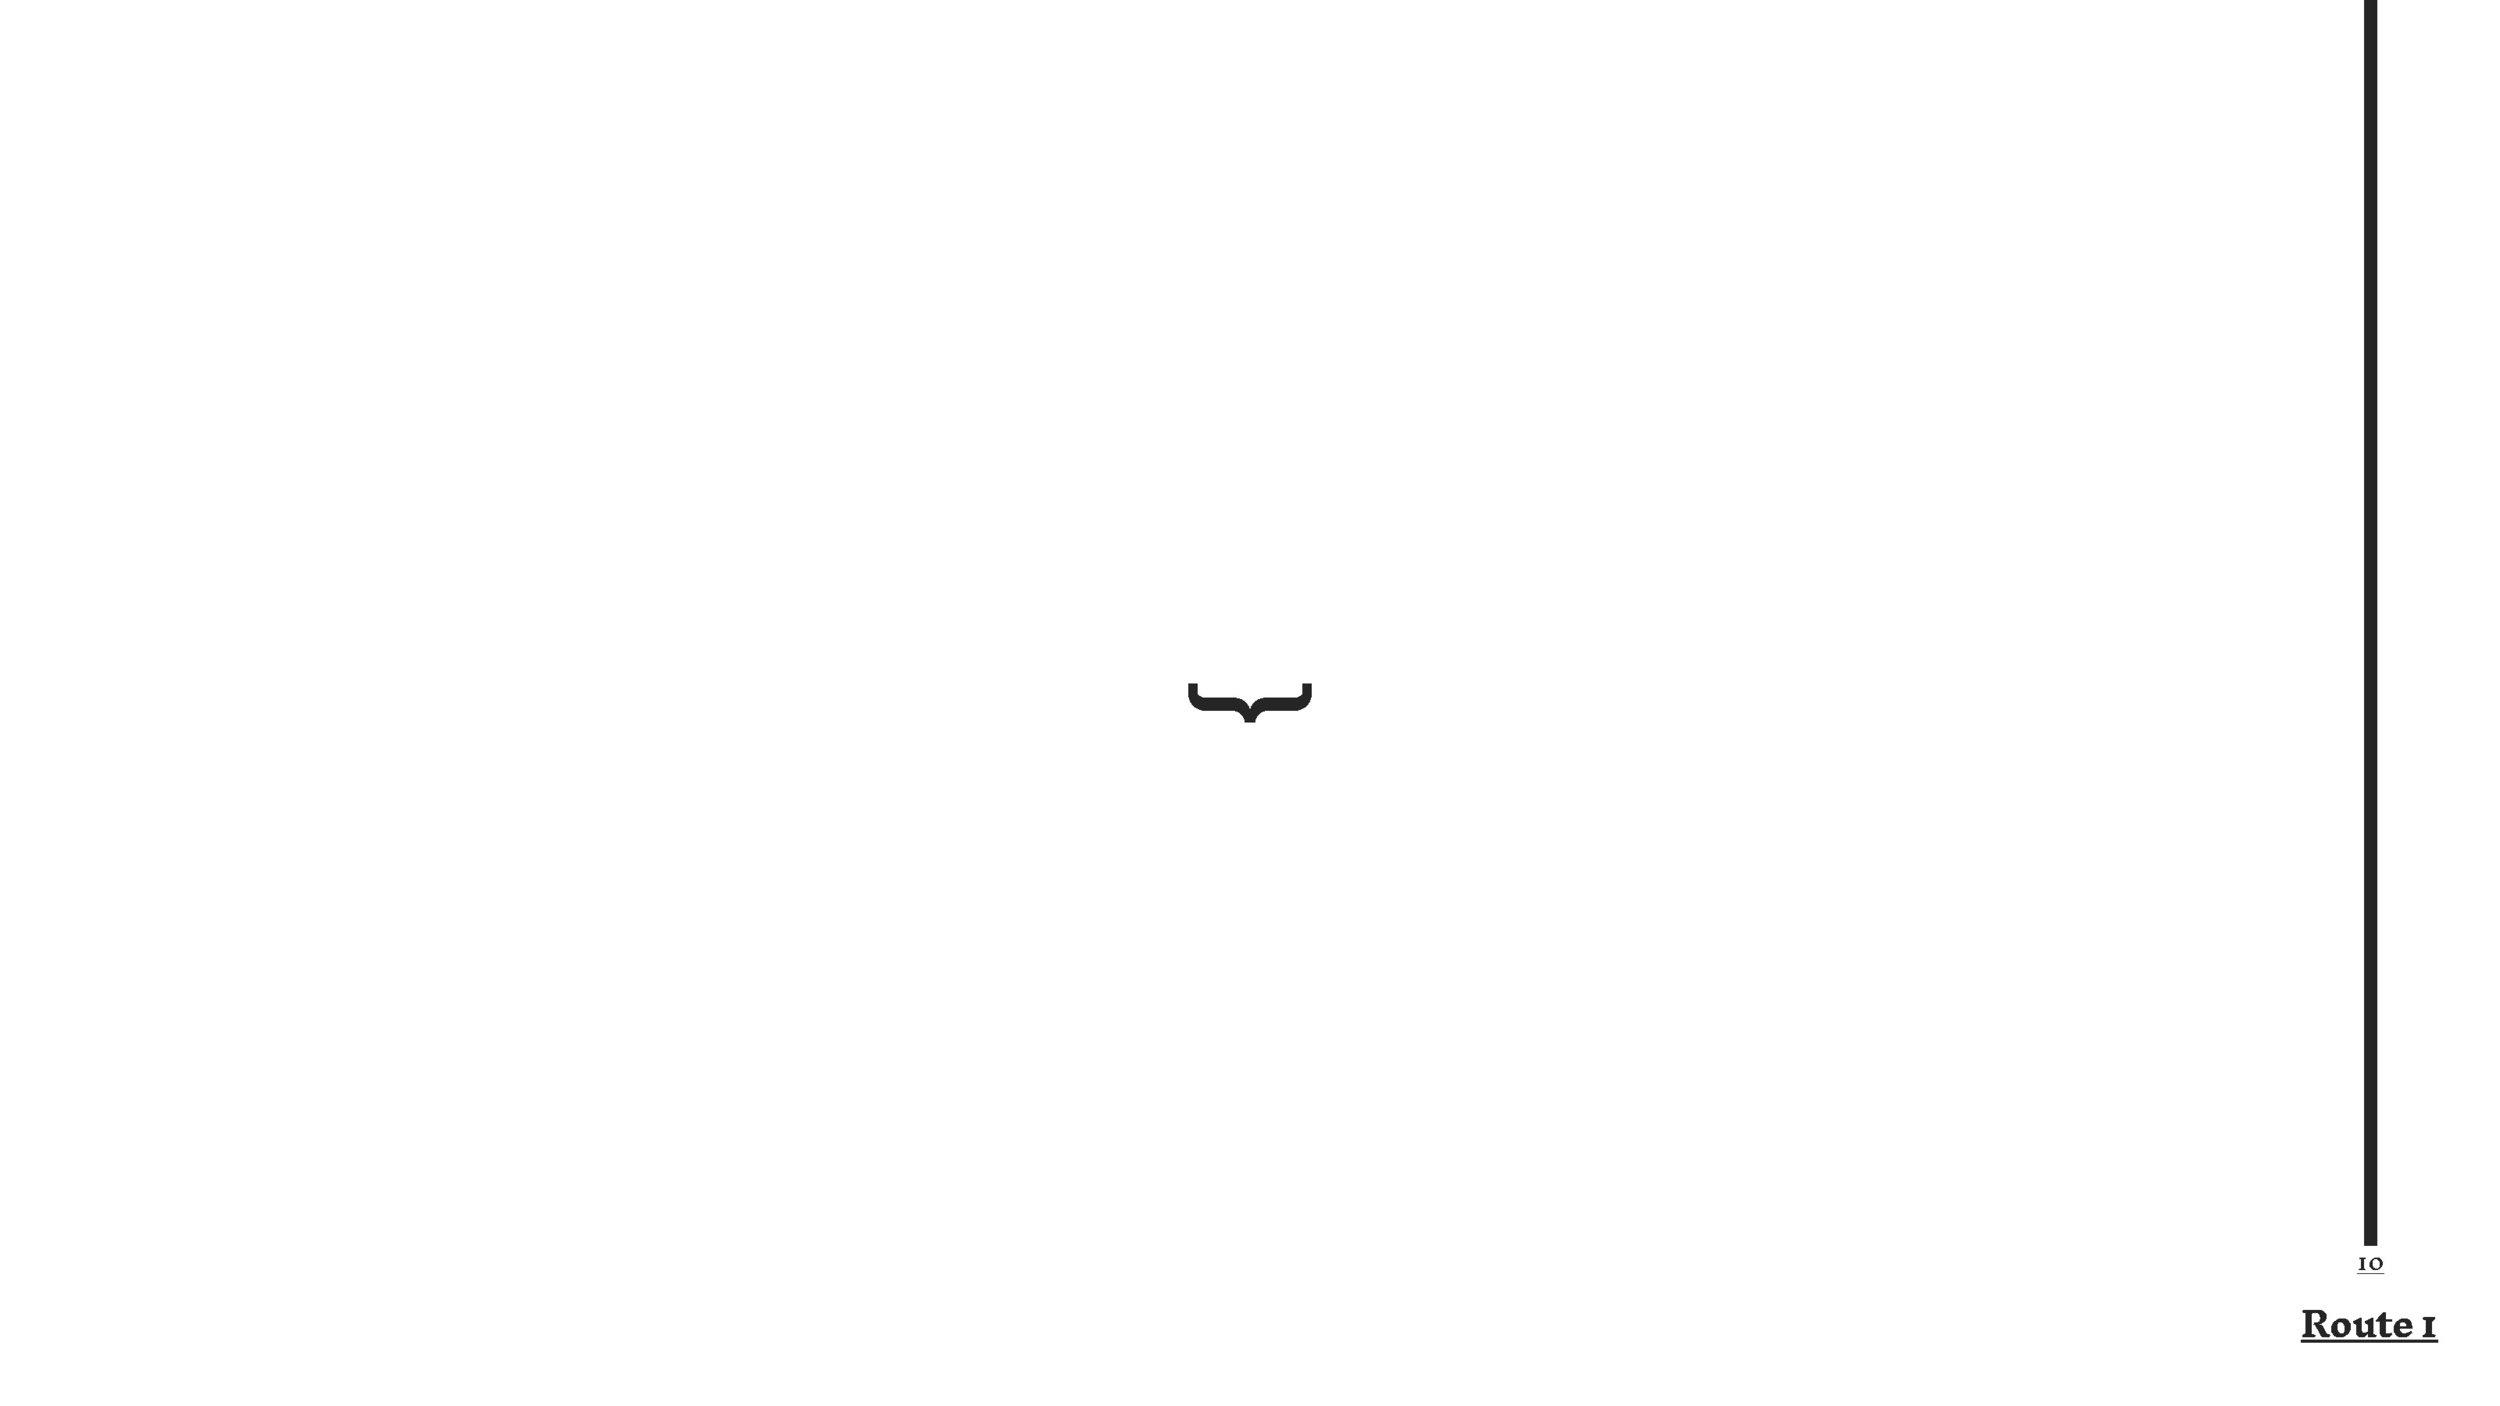 1.Orca_Presentation01_SarahMcDonnell2018_Page_10.jpg